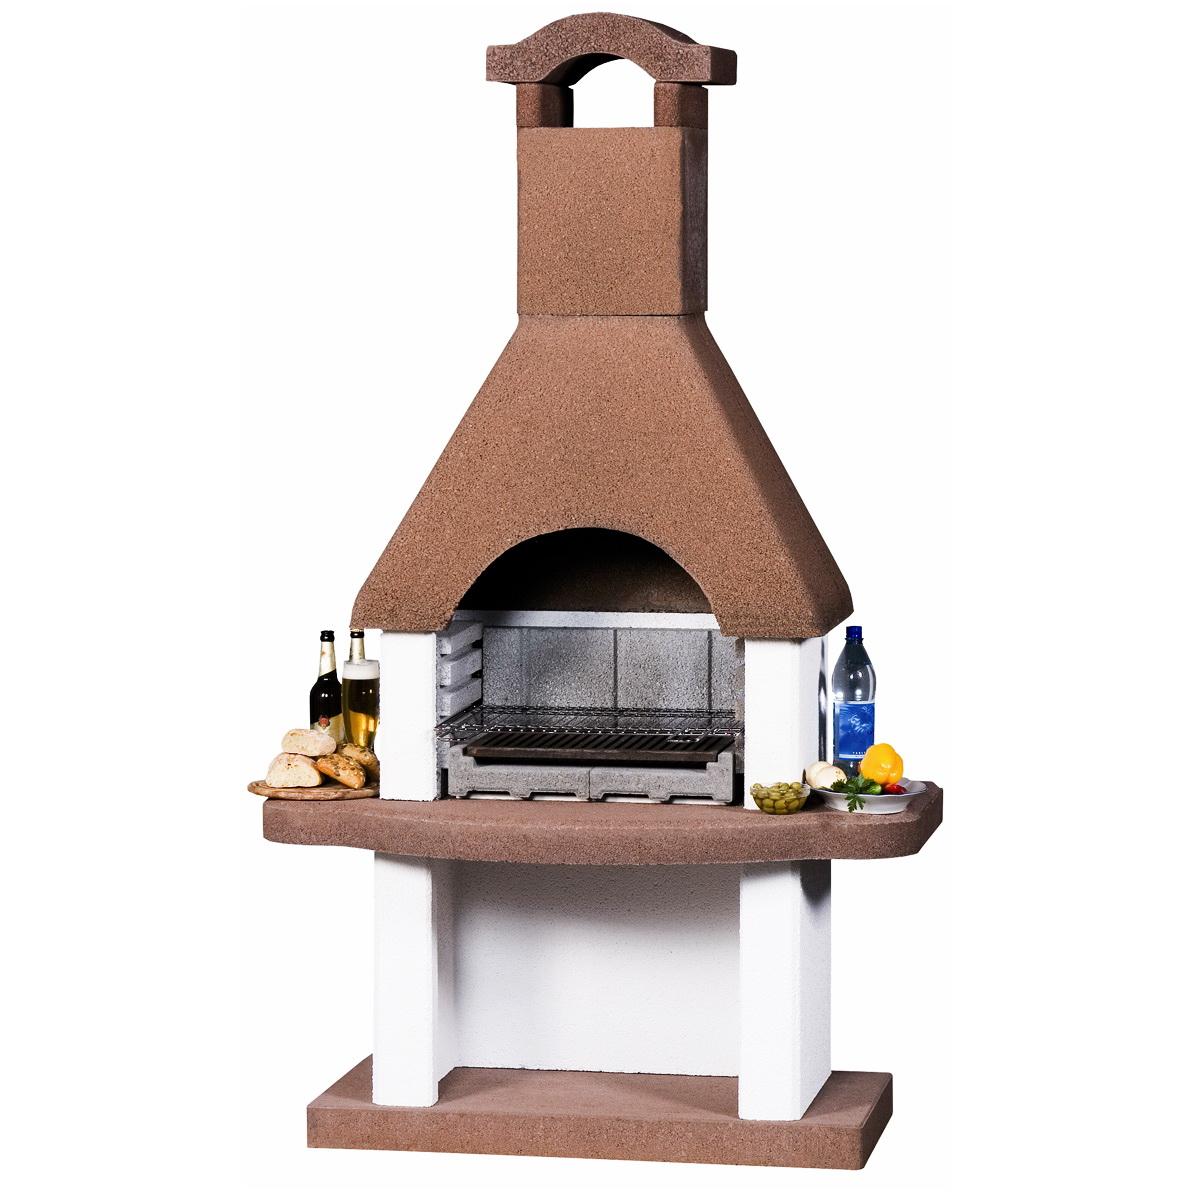 Barbecue bbq beton nr. 5 200x120x65cm / 430kg